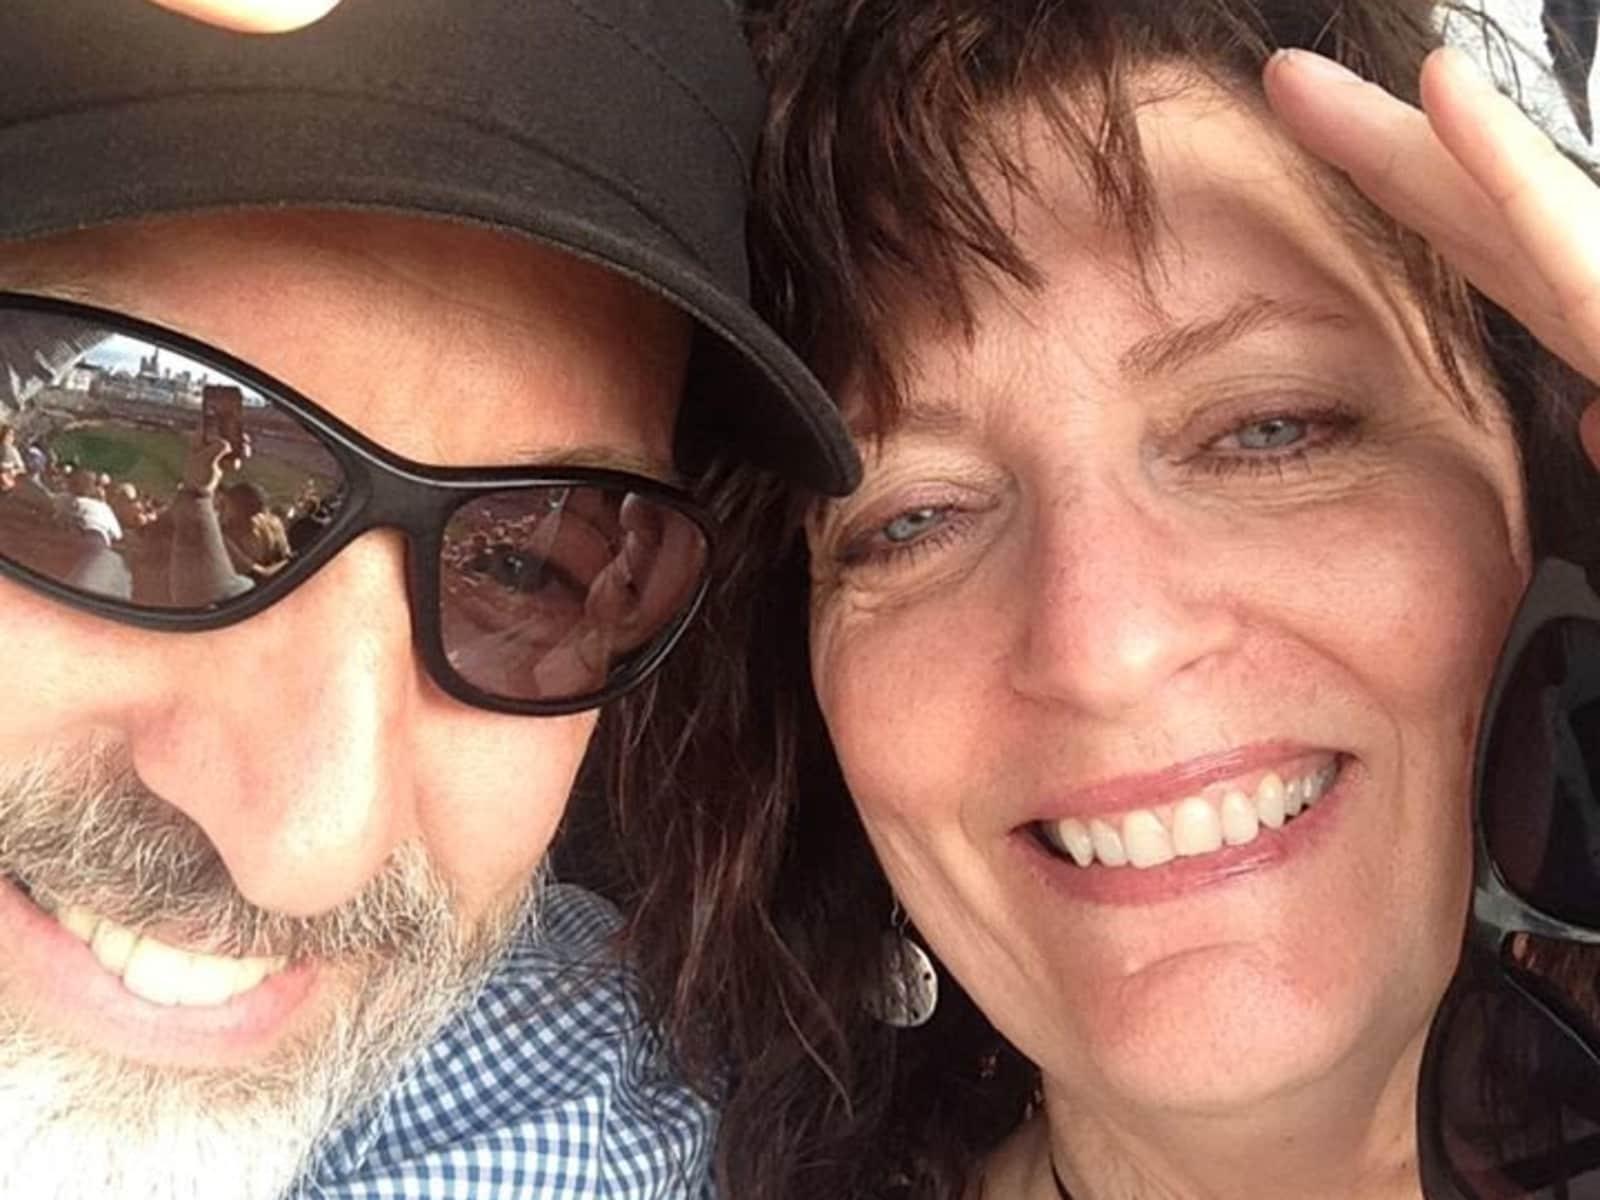 Lori j & Doug from Woodinville, Washington, United States